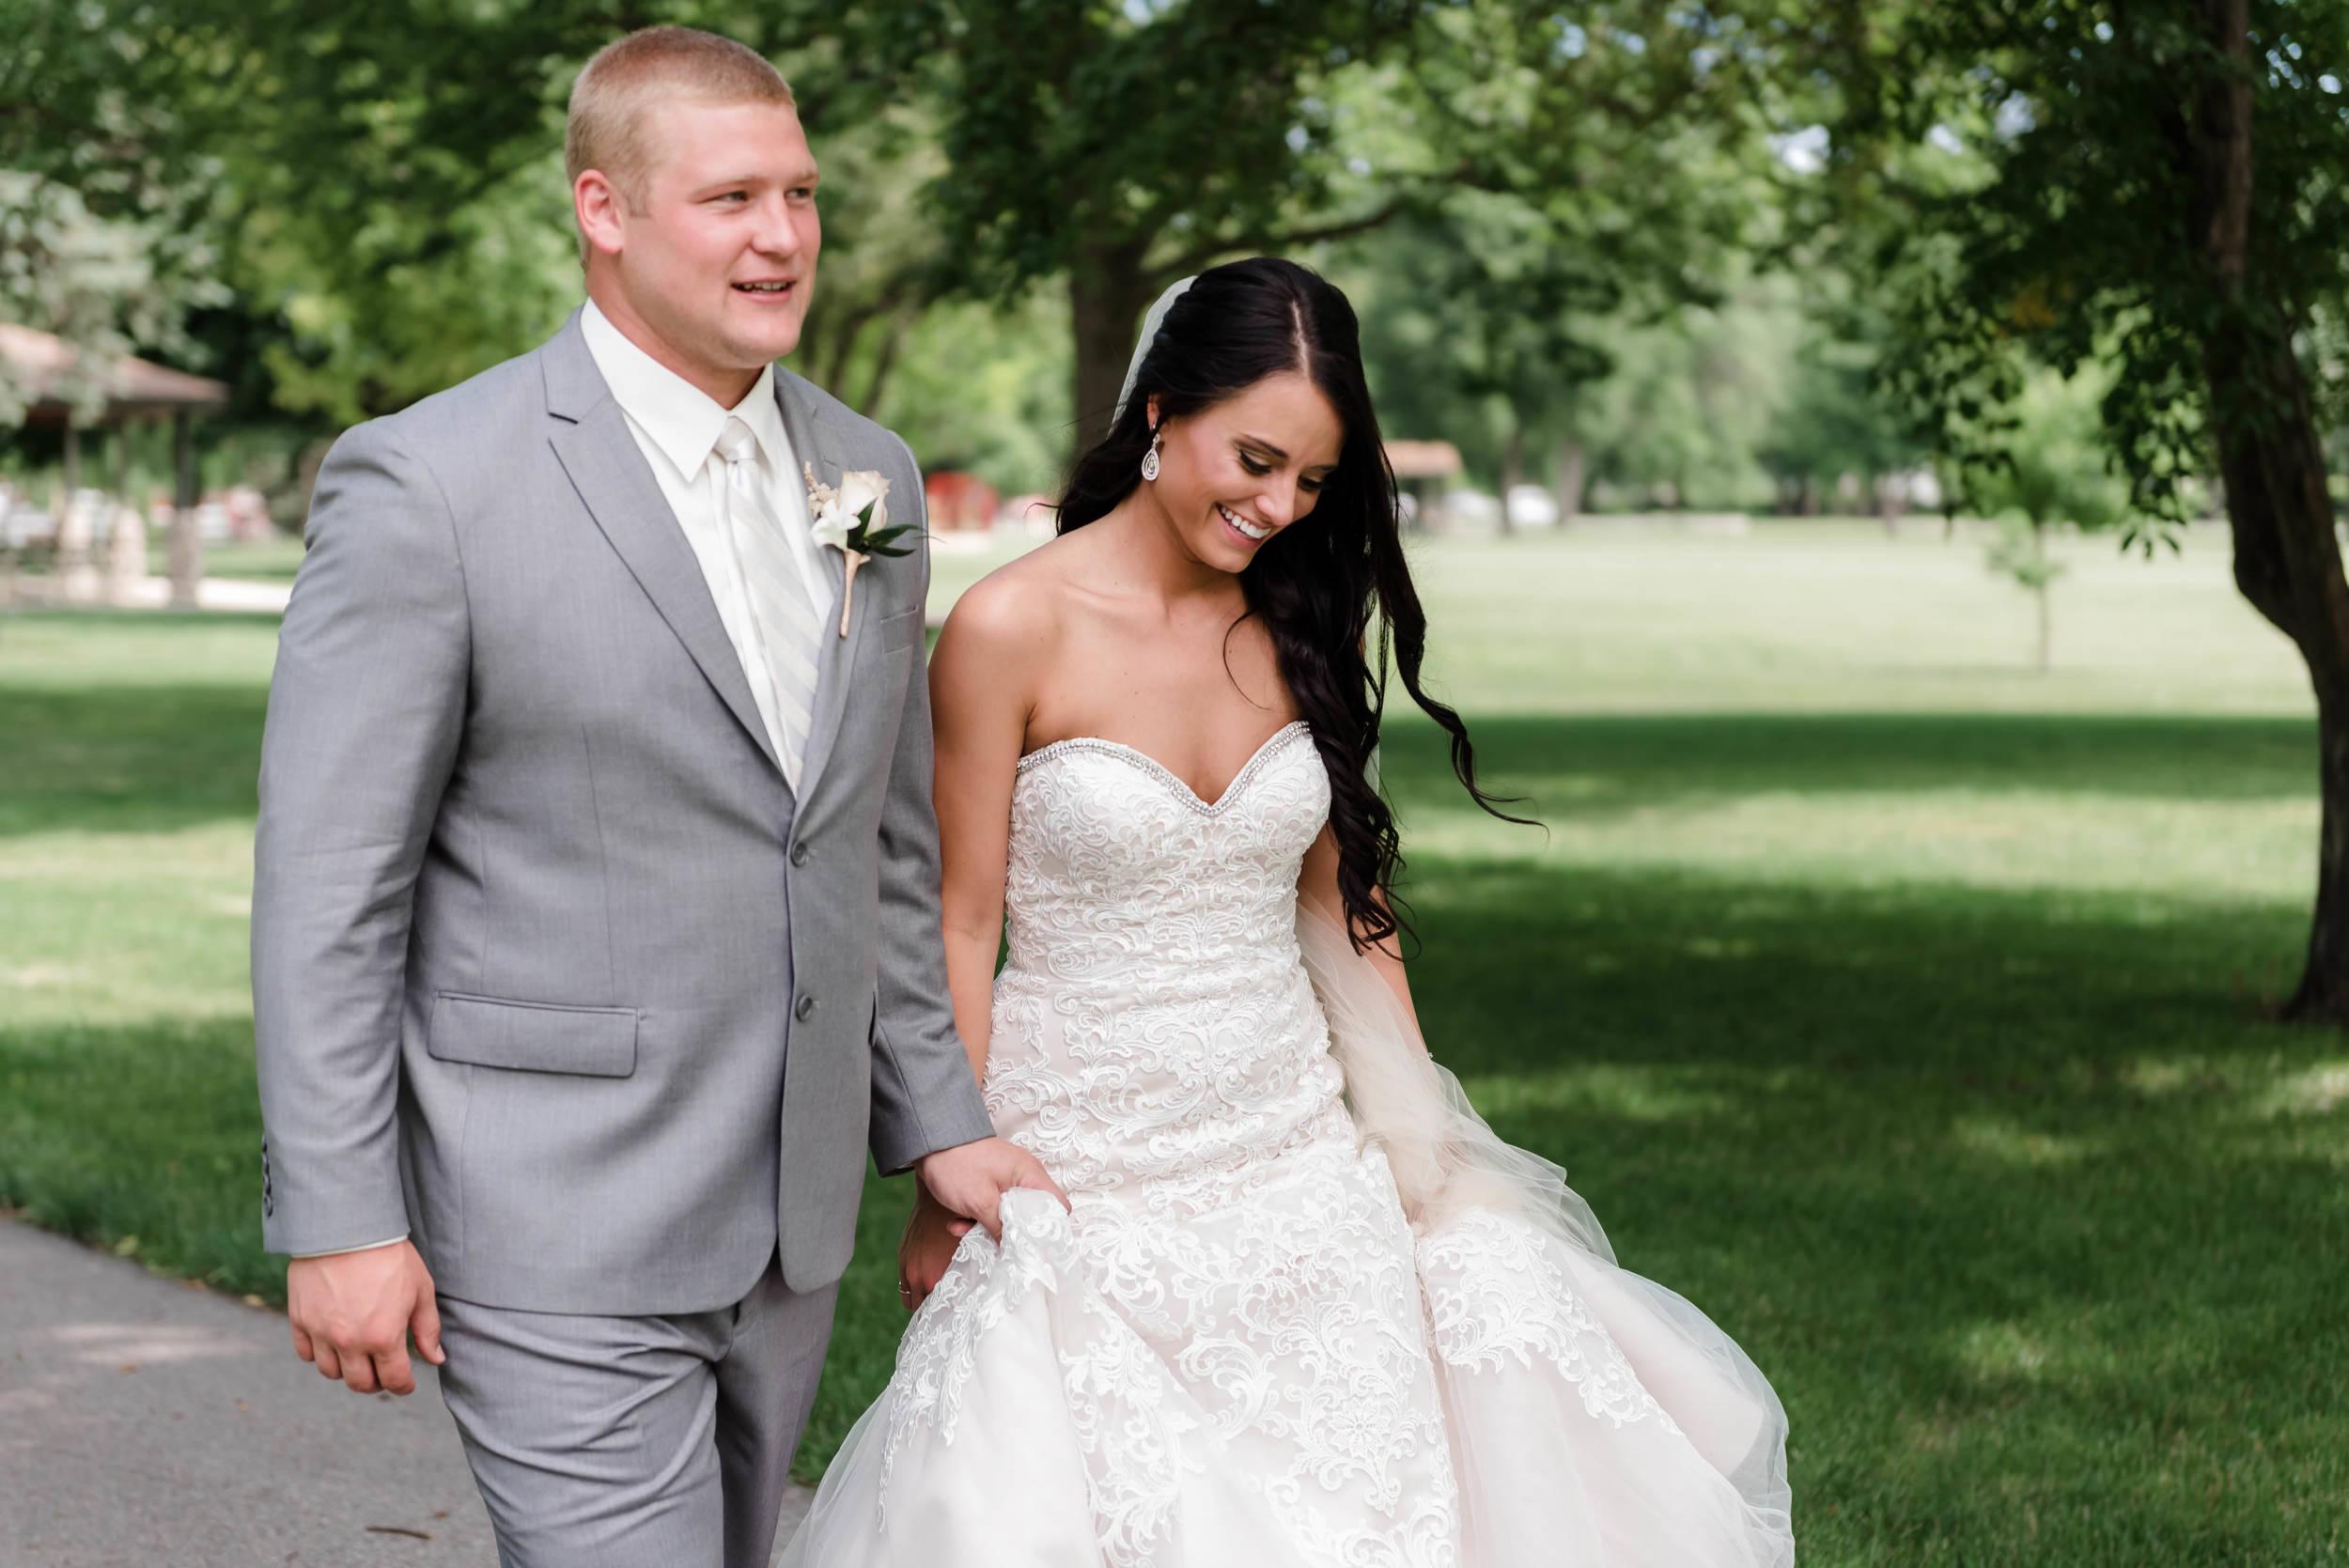 Layce and Brandon - Wedding - Outdoor Portraits-13.jpg